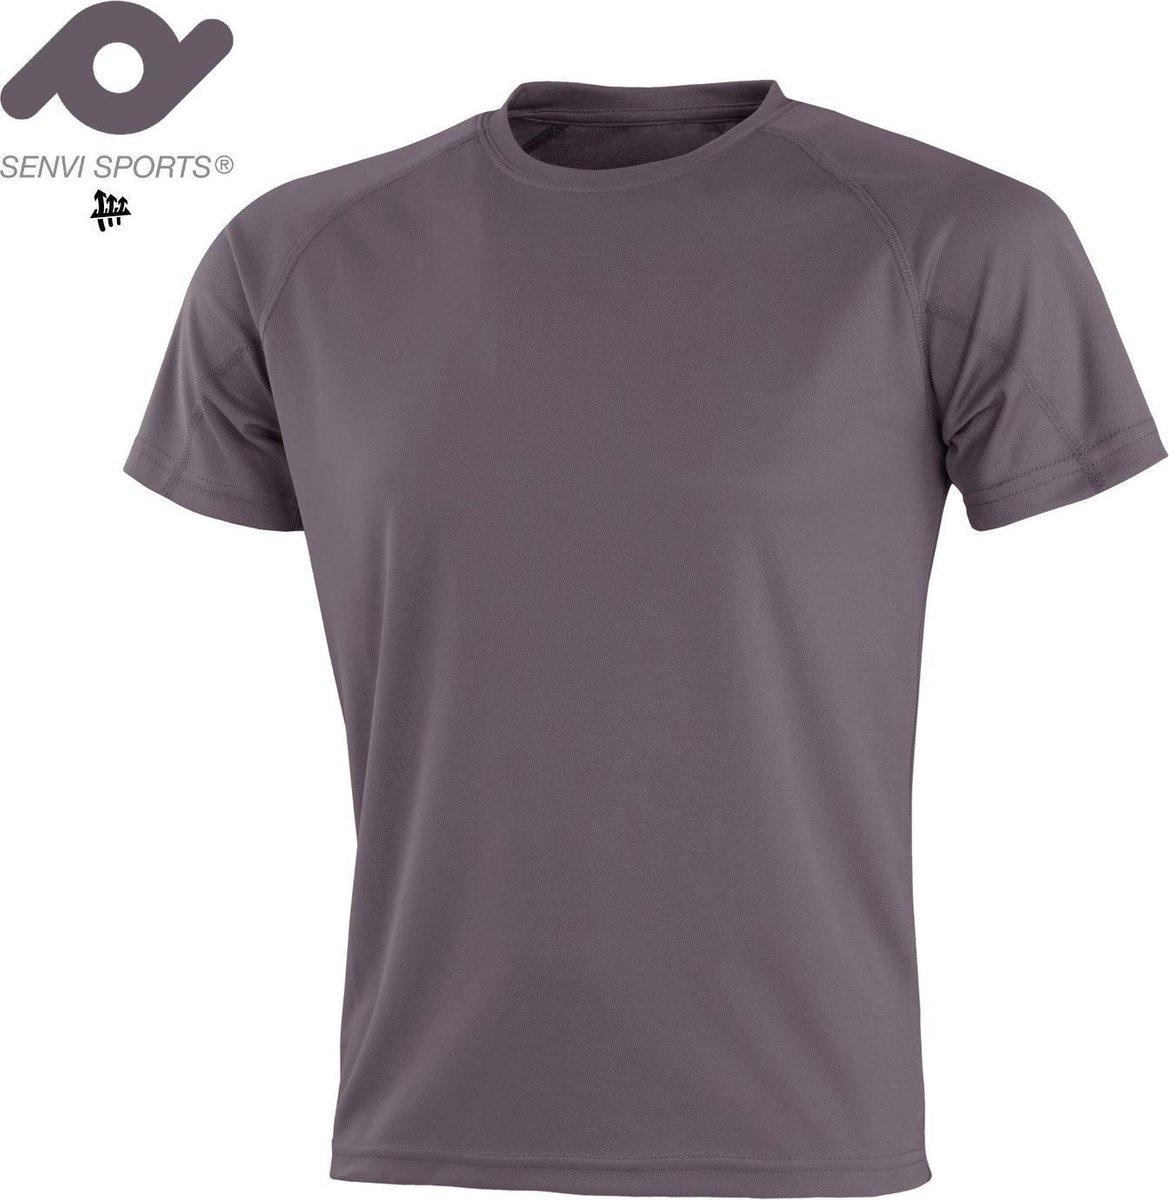 Senvi Sports Performance T-Shirt - Grijs - 3XL - Unisex